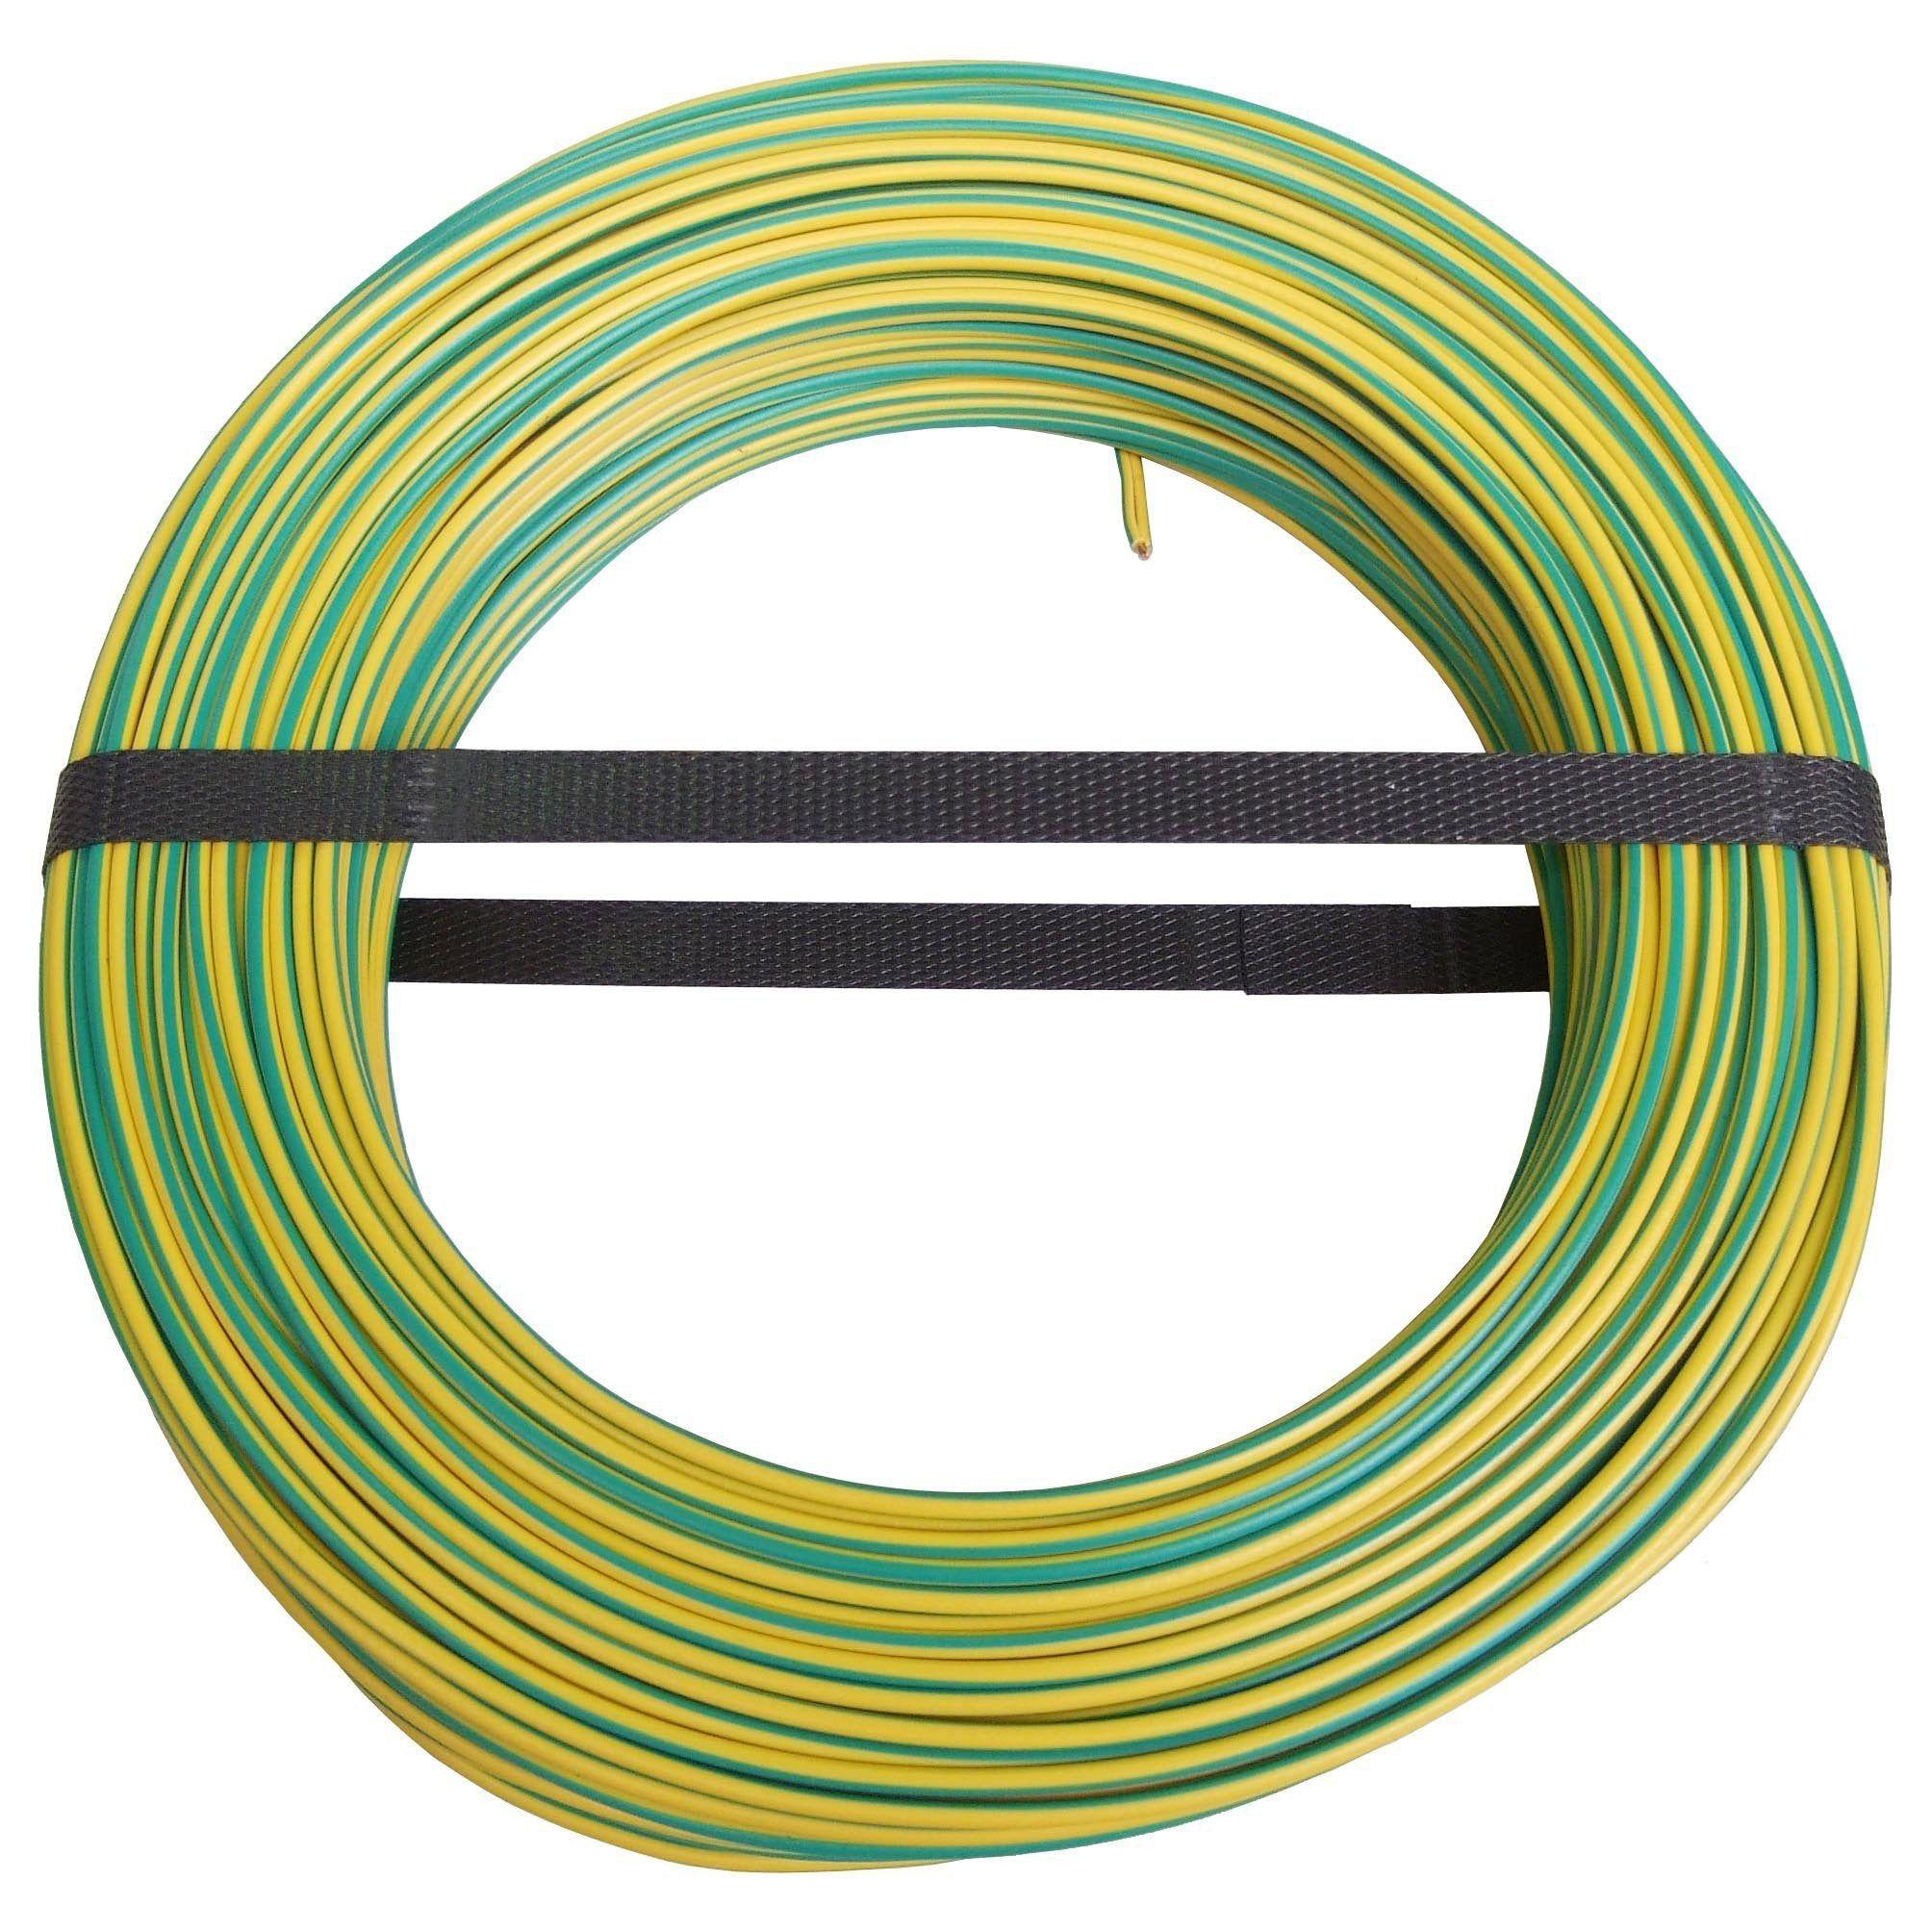 Fil Electrique H07vu Vert Jaune 1 5 Mm L 100 M Vert Jaune Vert Et Fil Electrique